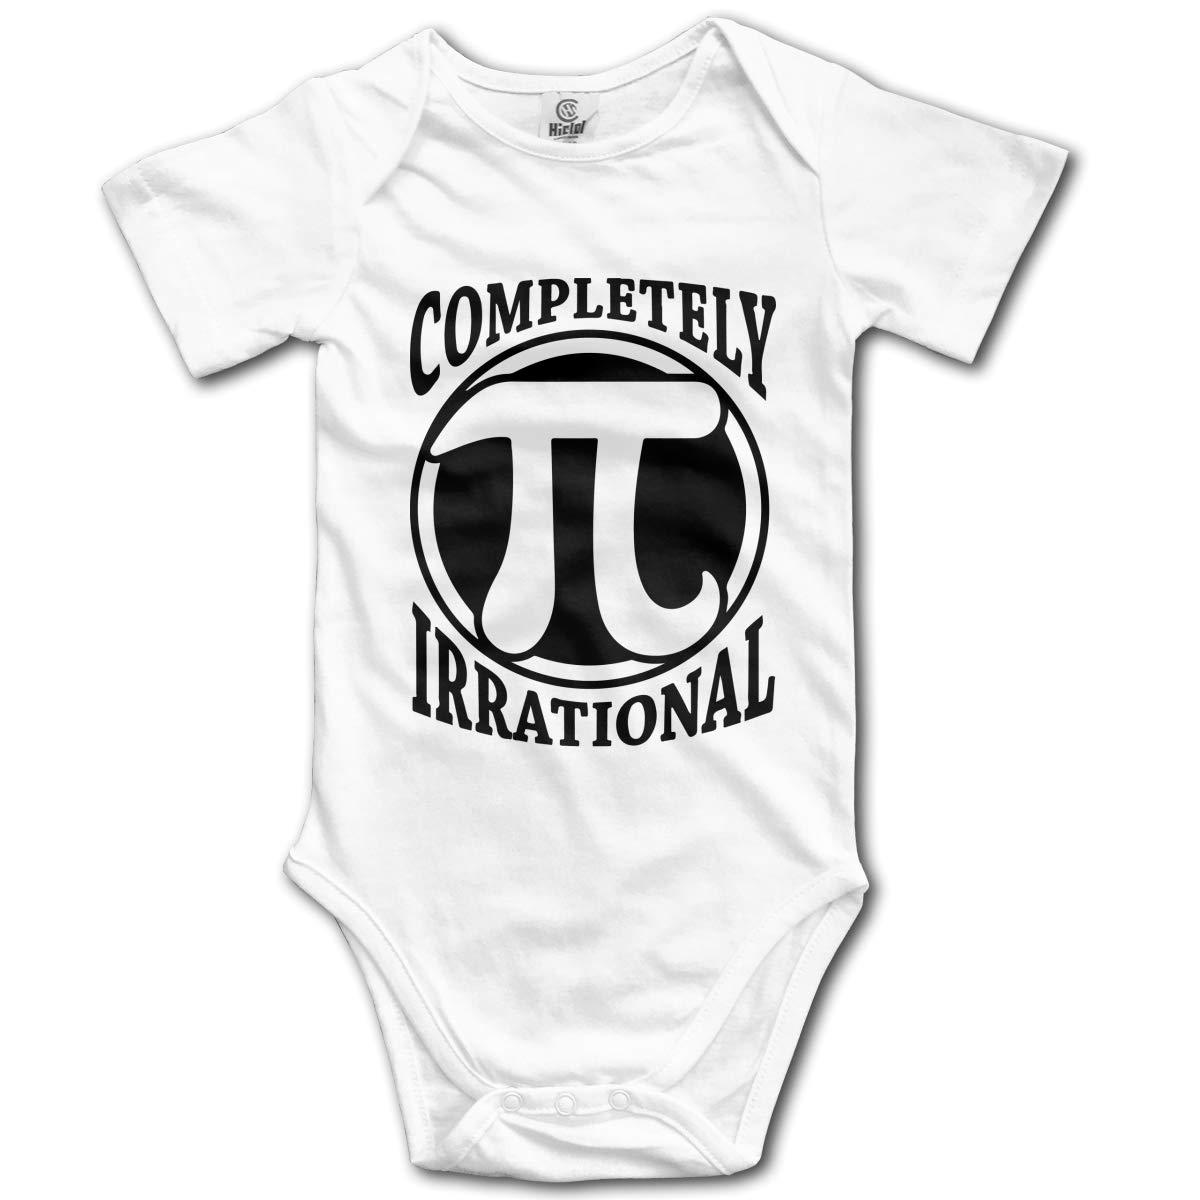 CDHL99 Completely Irrational Pi Math-1 Kids Girl Boy Short Sleeve Layette Bodysuit 0-24M